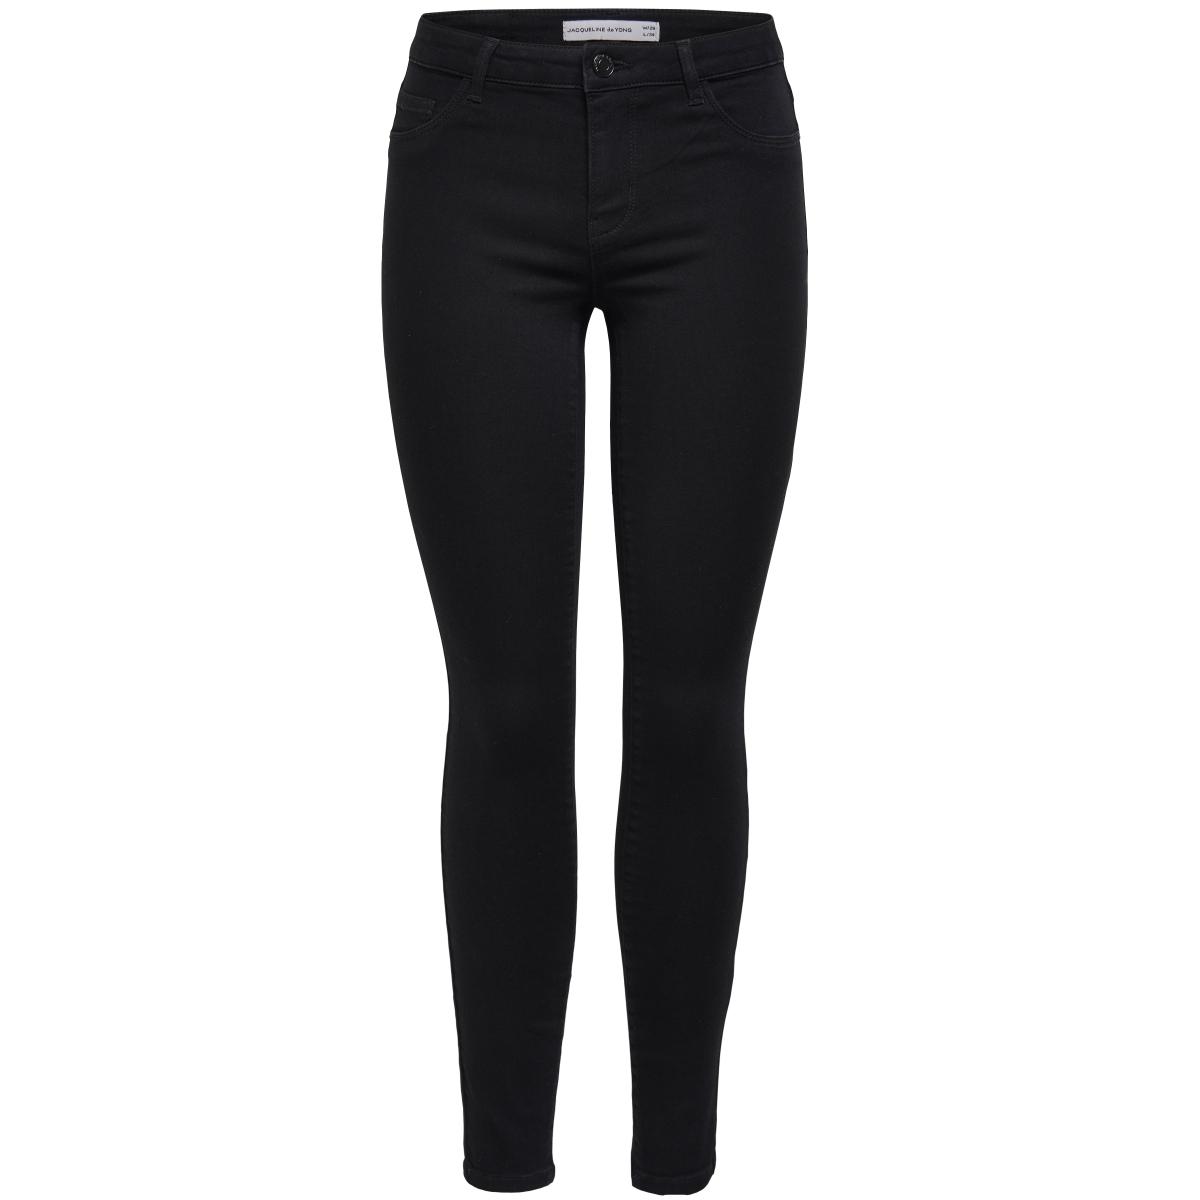 jdyskinny reg. ulle black jeans dnm 15133579 jacqueline de yong jeans black